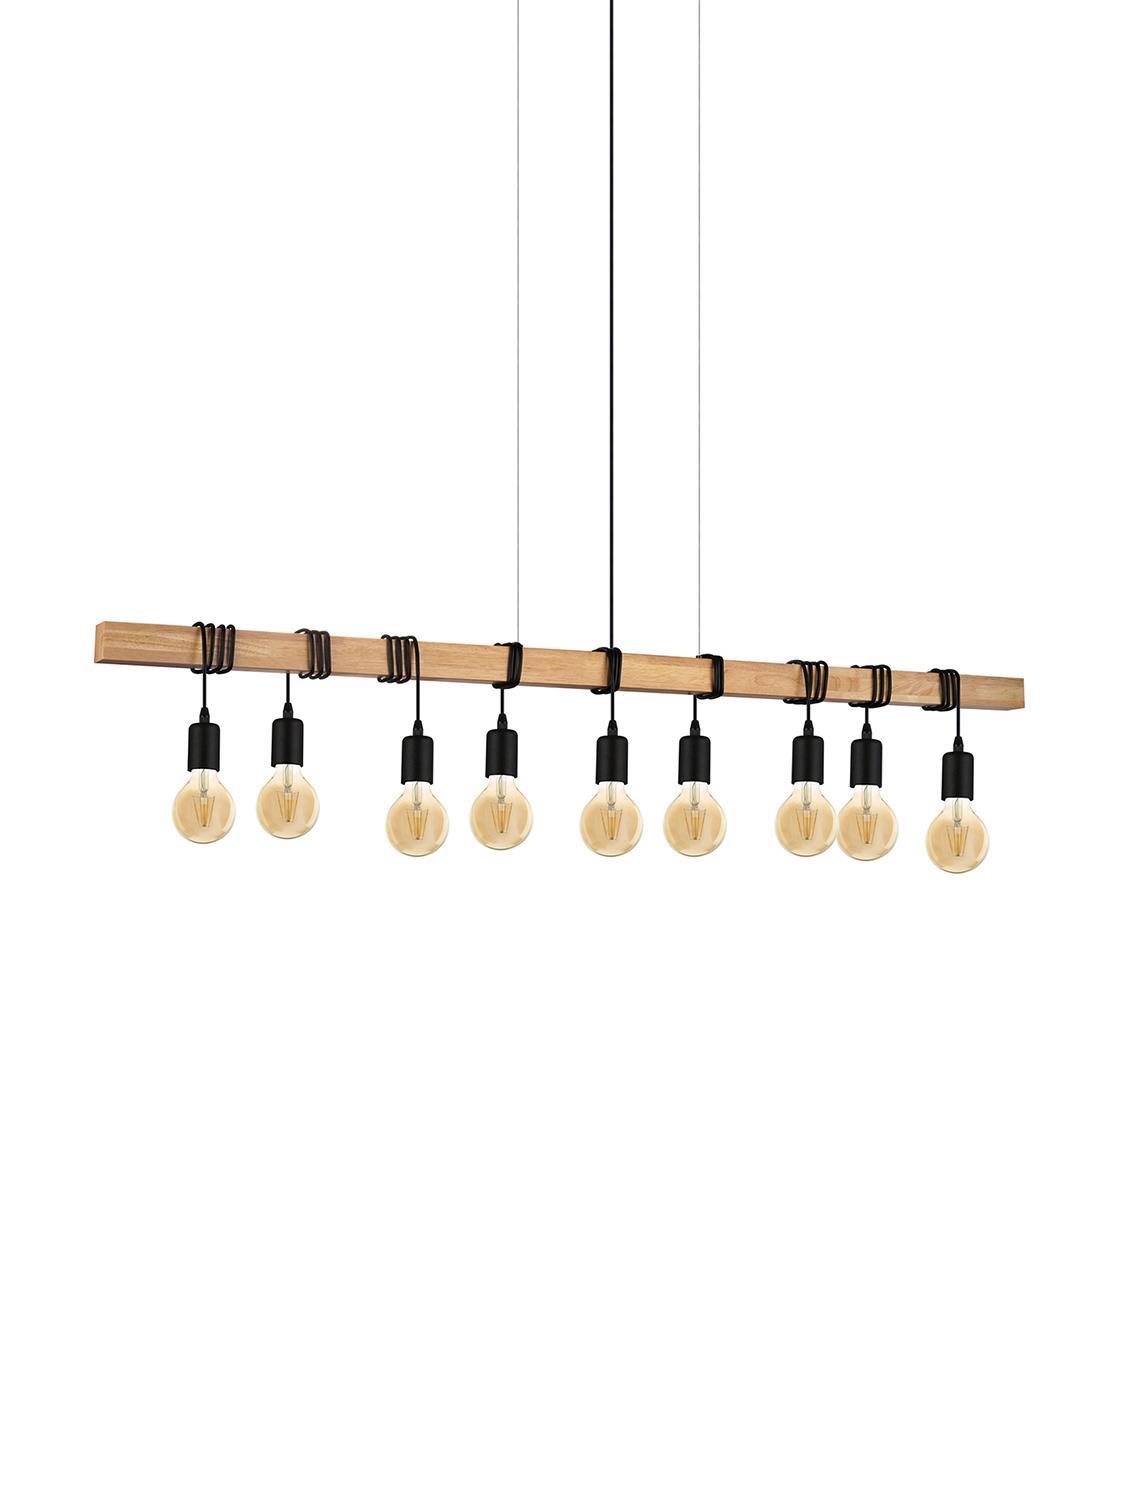 Grote hanglamp Townshend, Zwart, houtkleurig, 150 x 110 cm